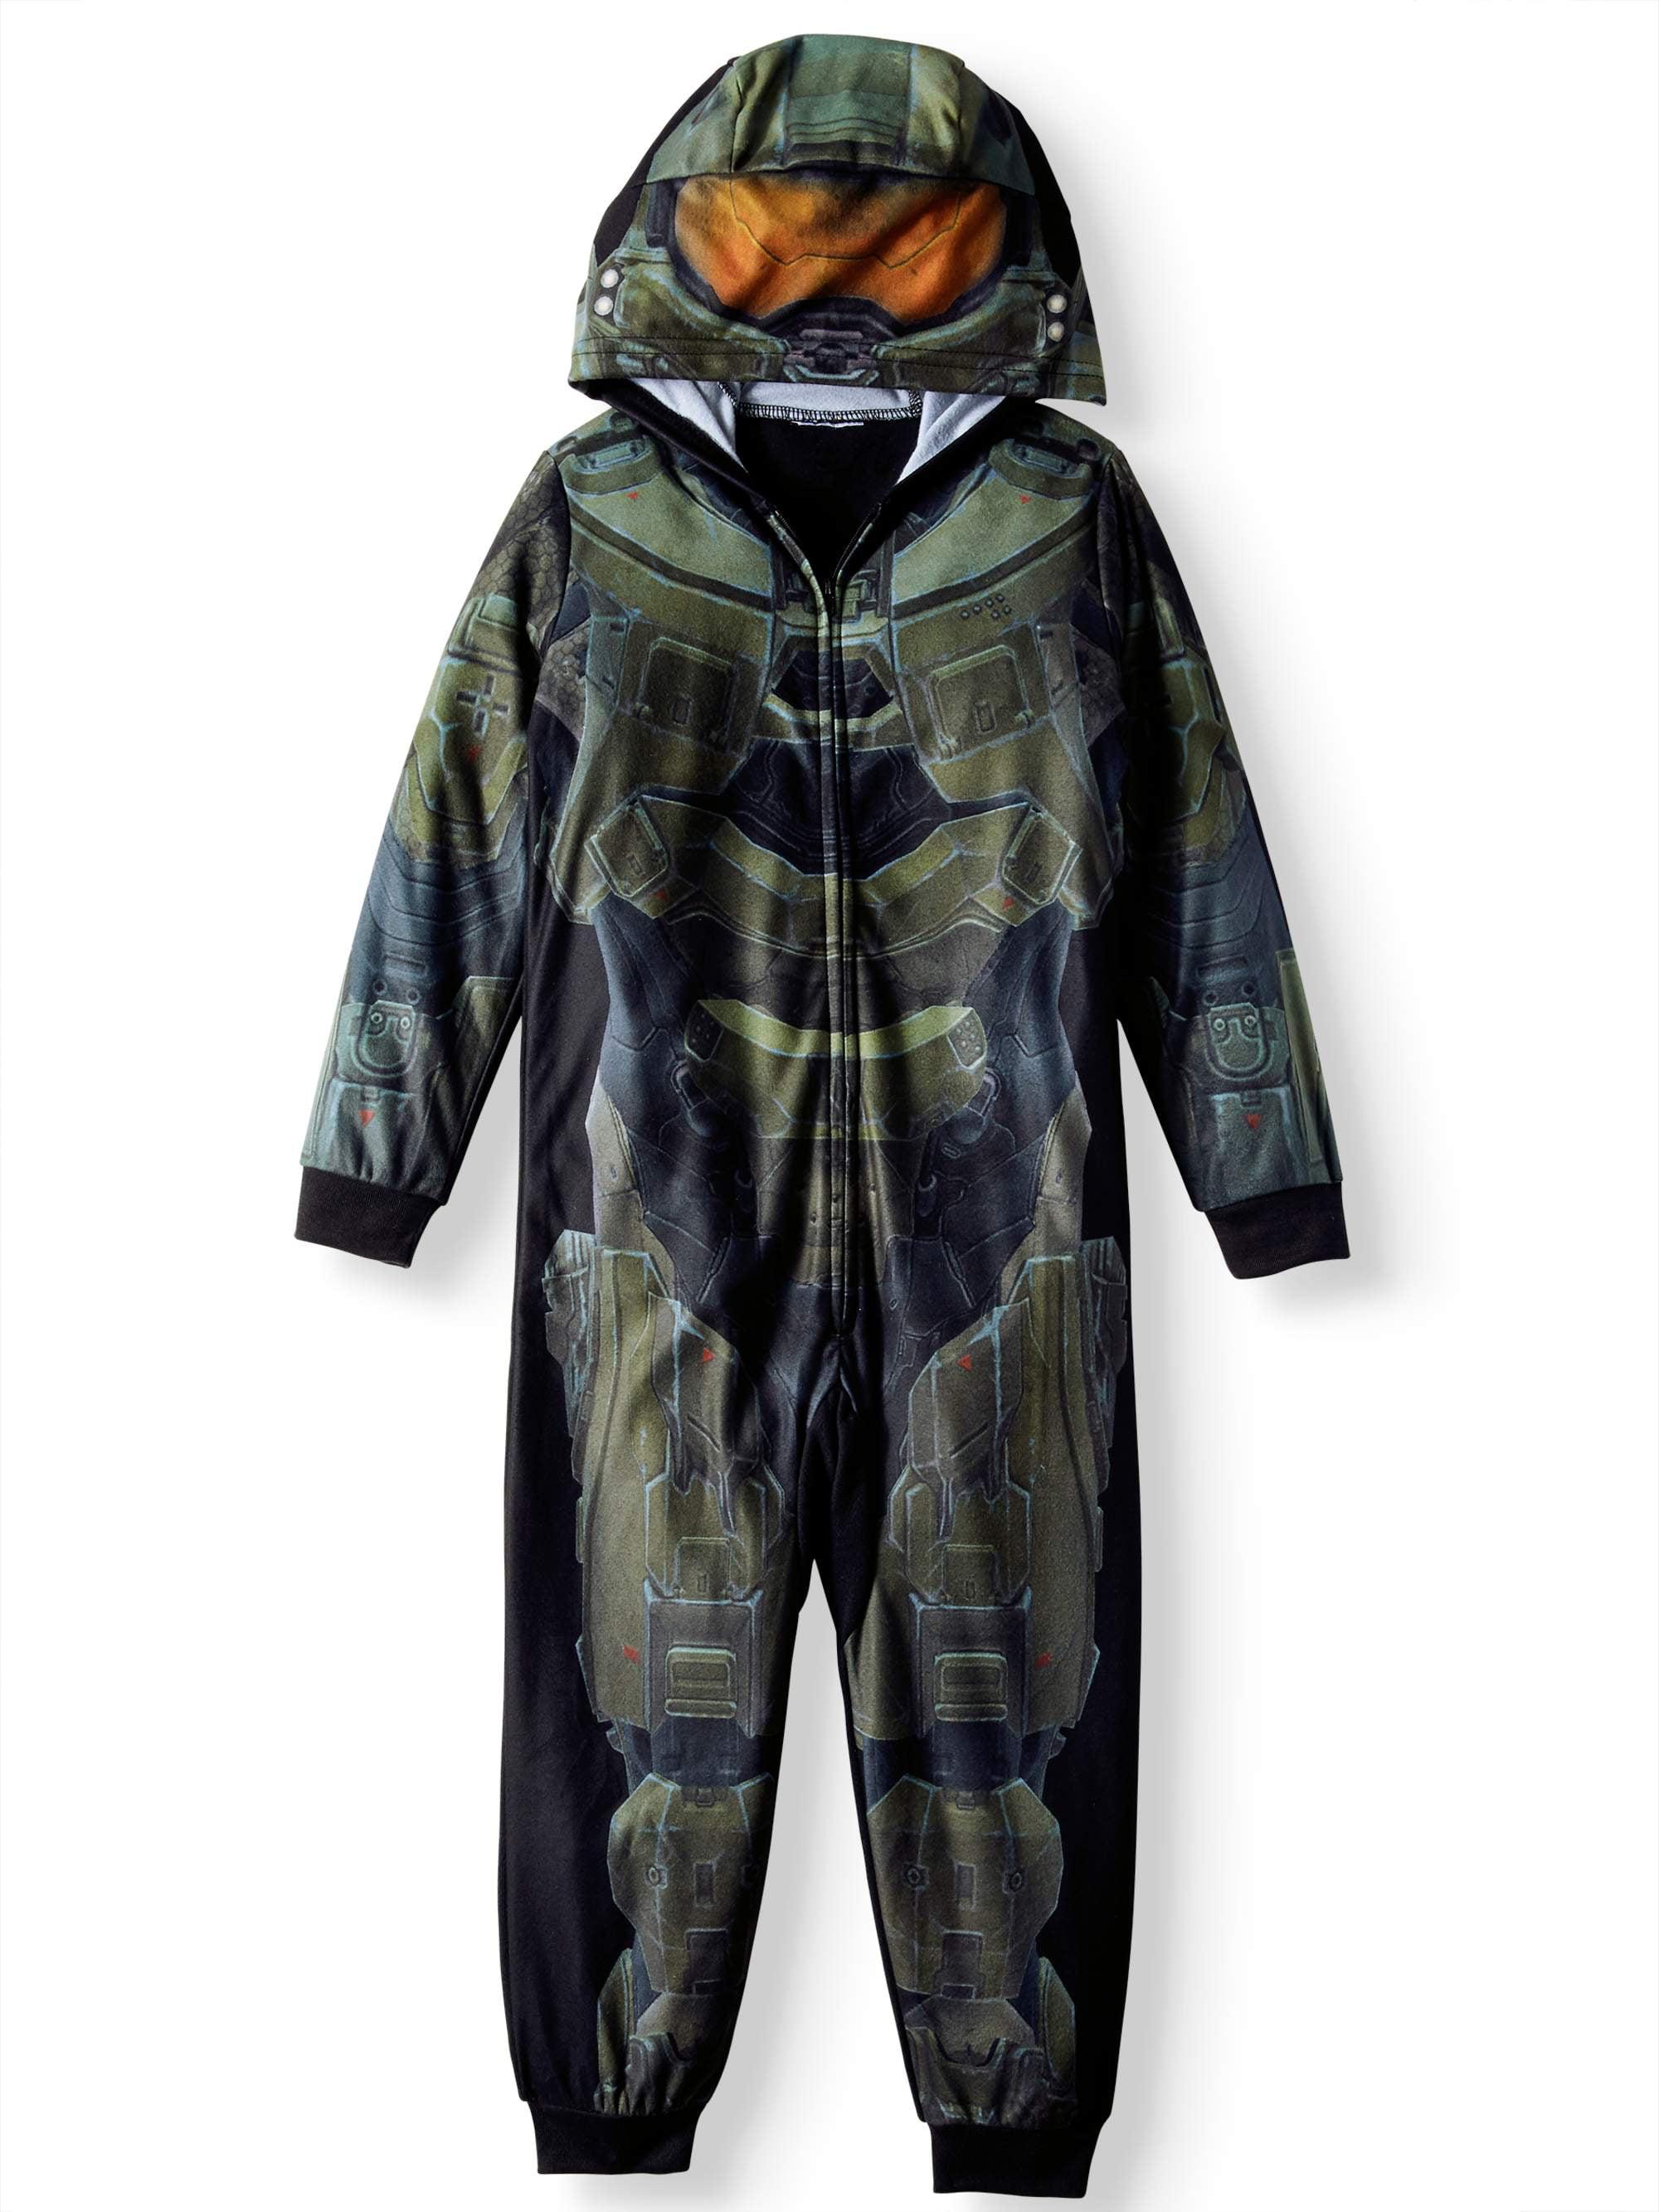 HALO Union Suit Pajama (Big Boy & Little Boy)